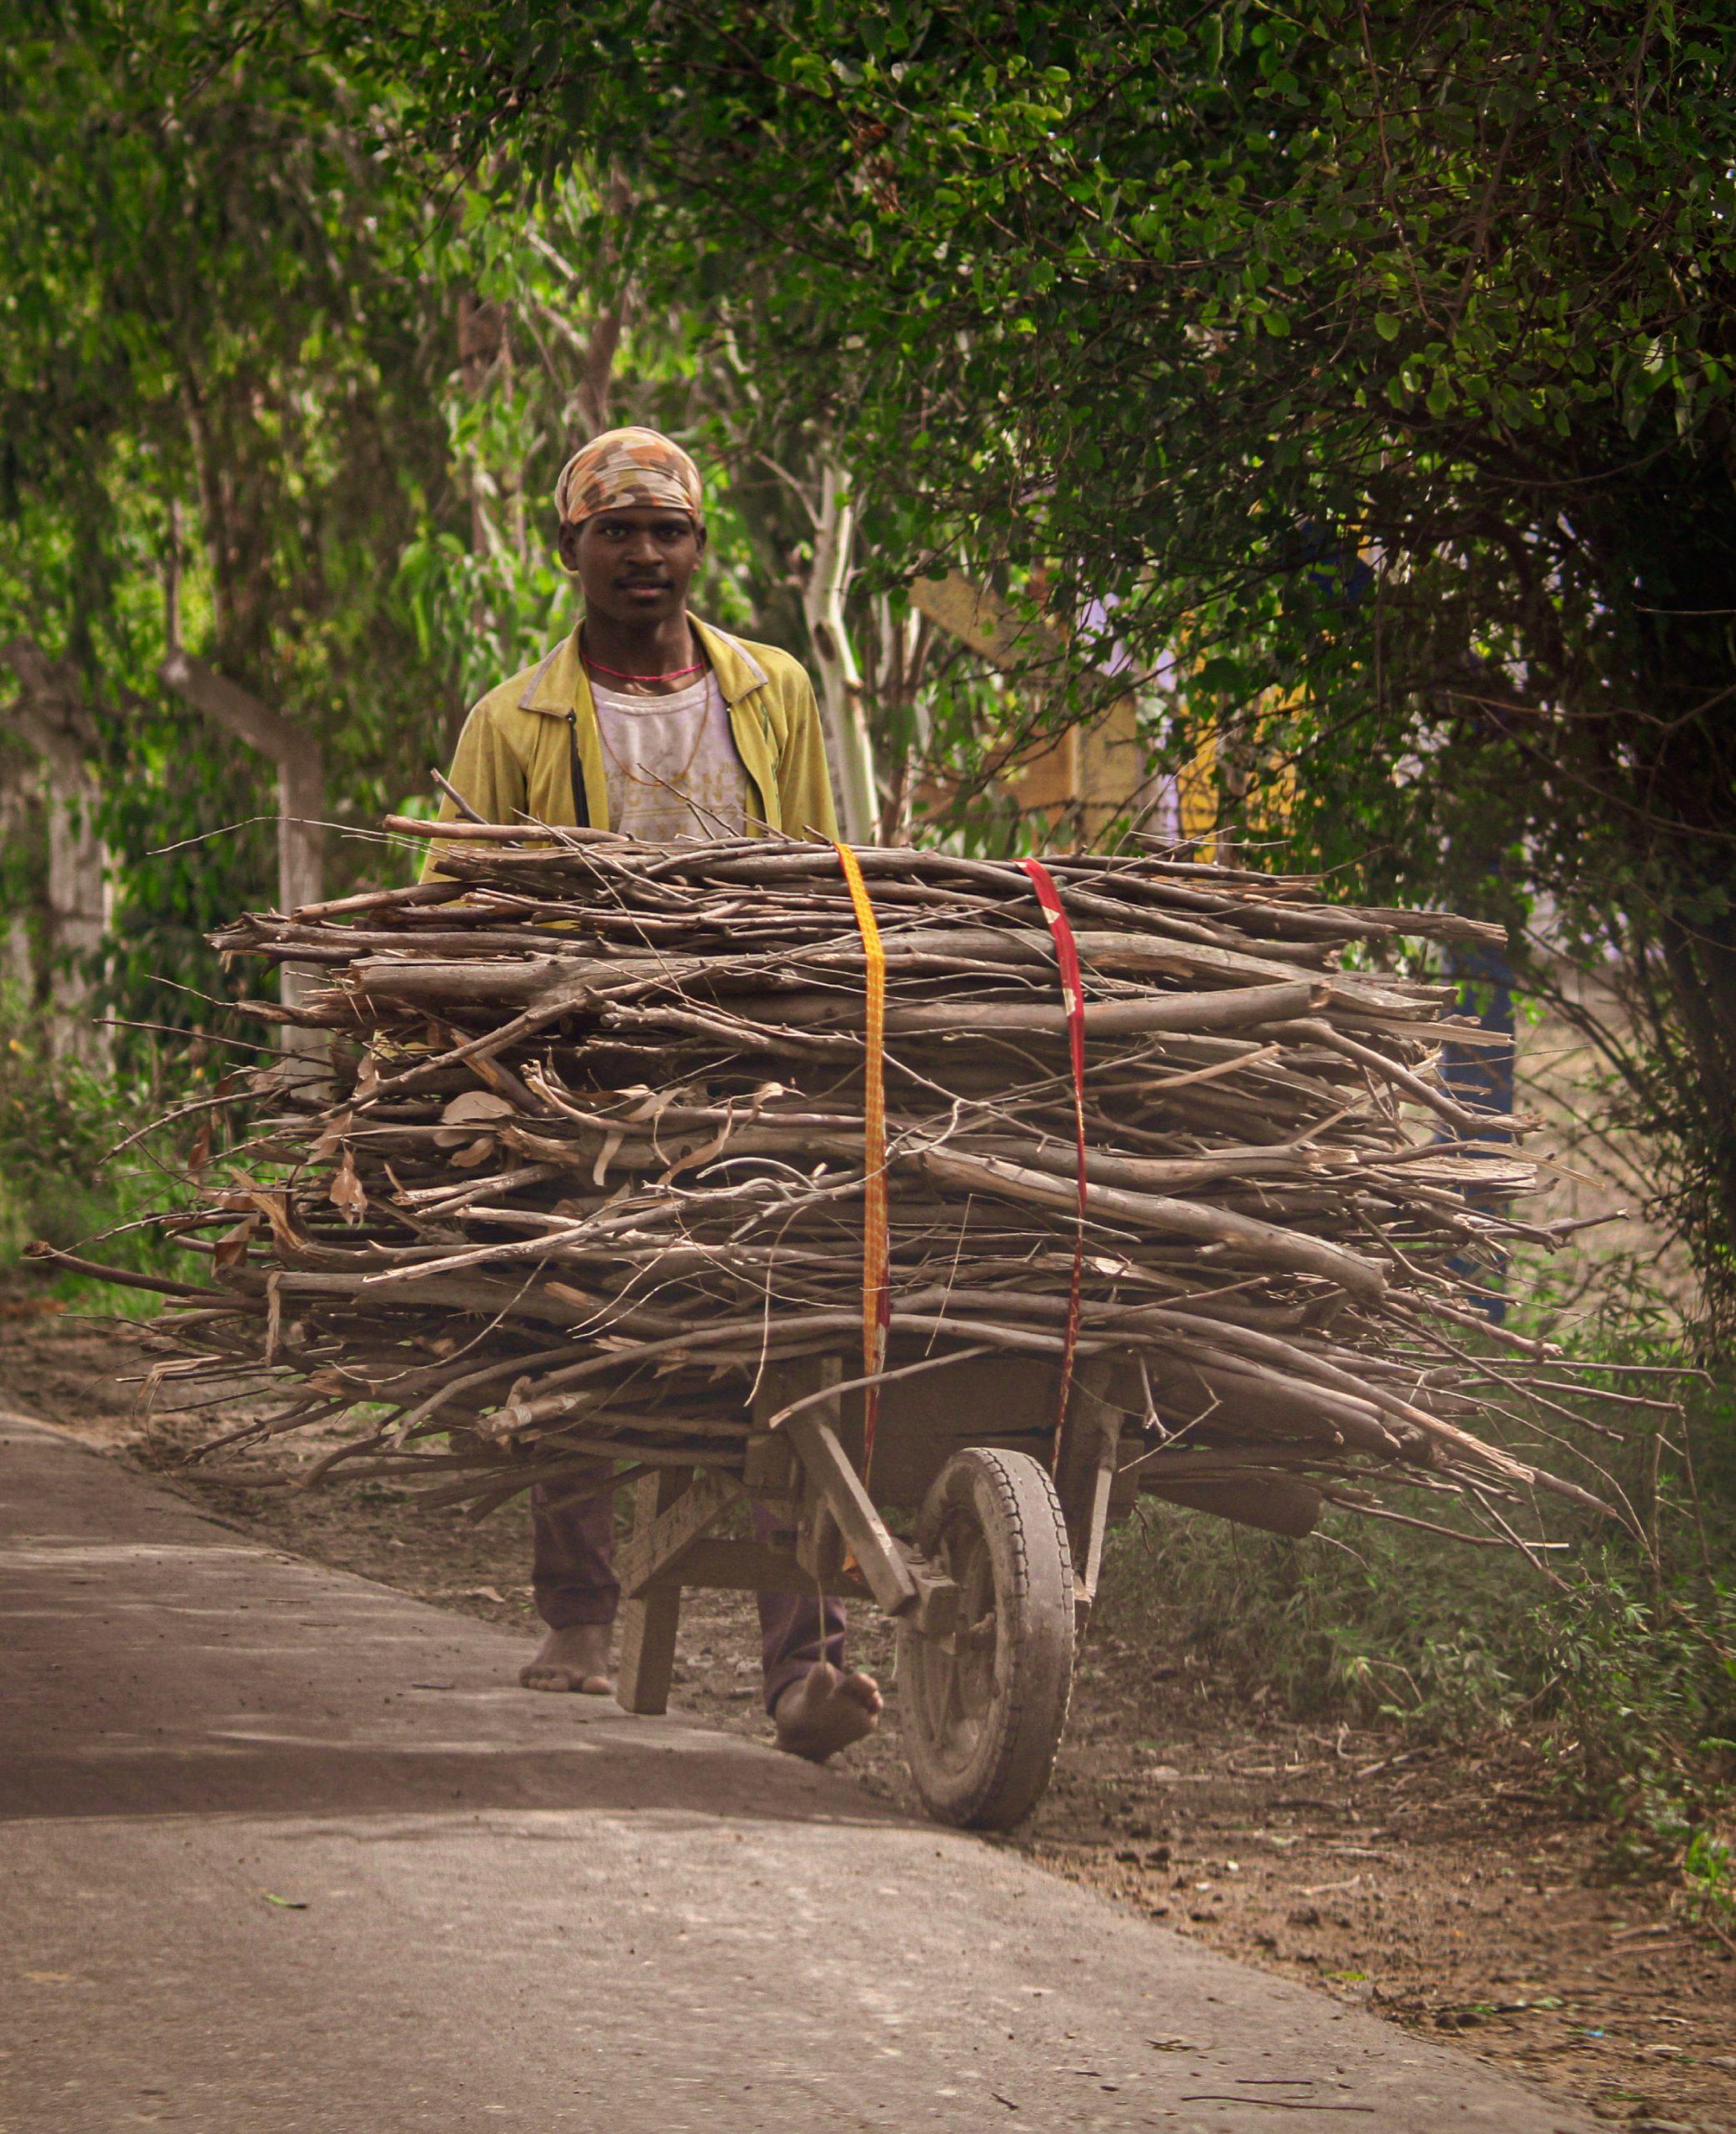 Man carrying woods on a Wheelbarrow